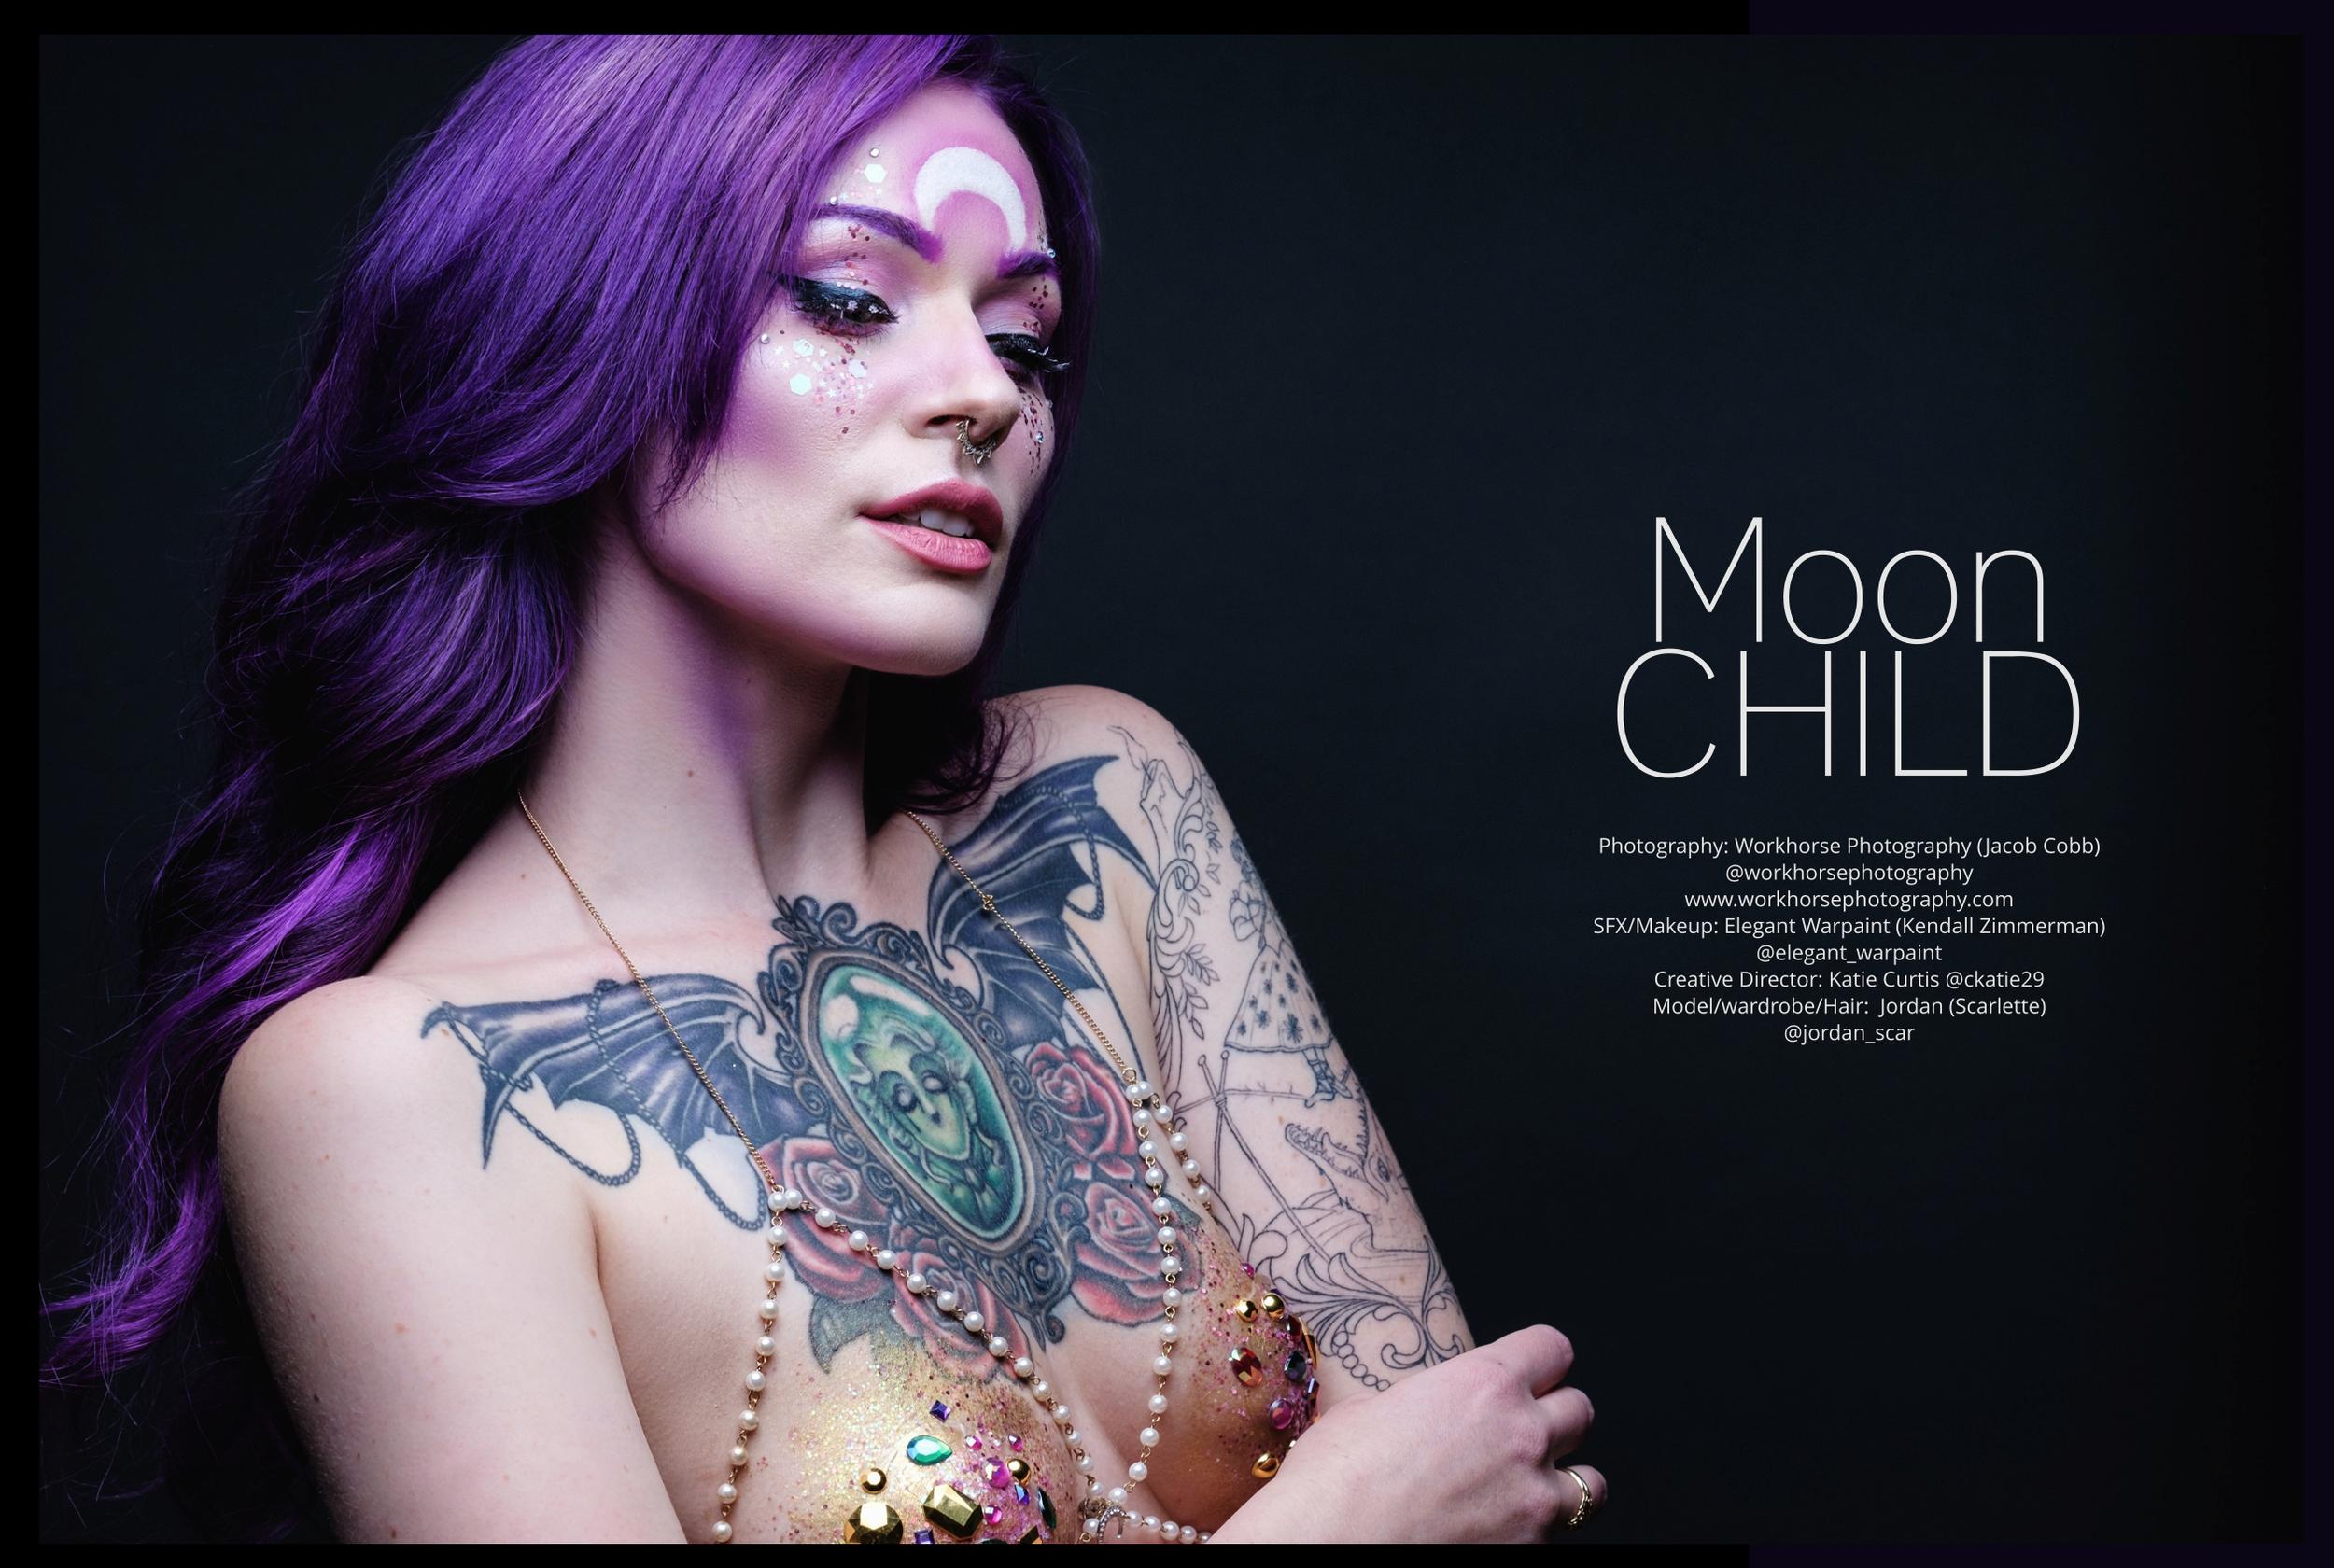 Moon Child-IMIRAGEmagazine #118 -